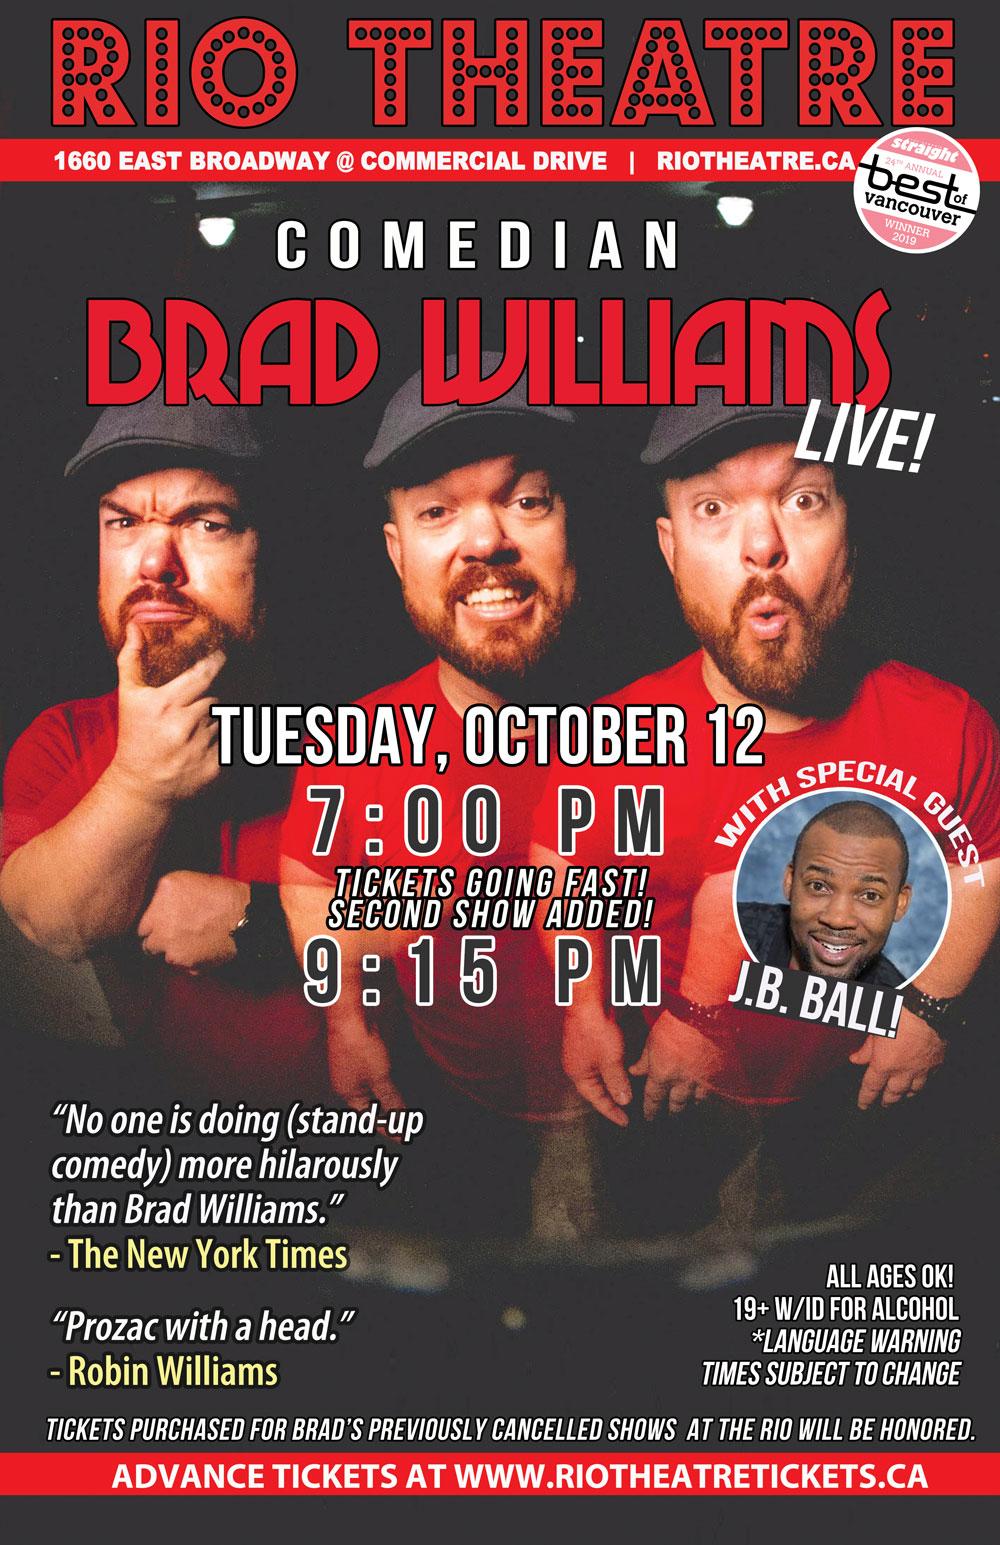 Brad Williams LIVE!